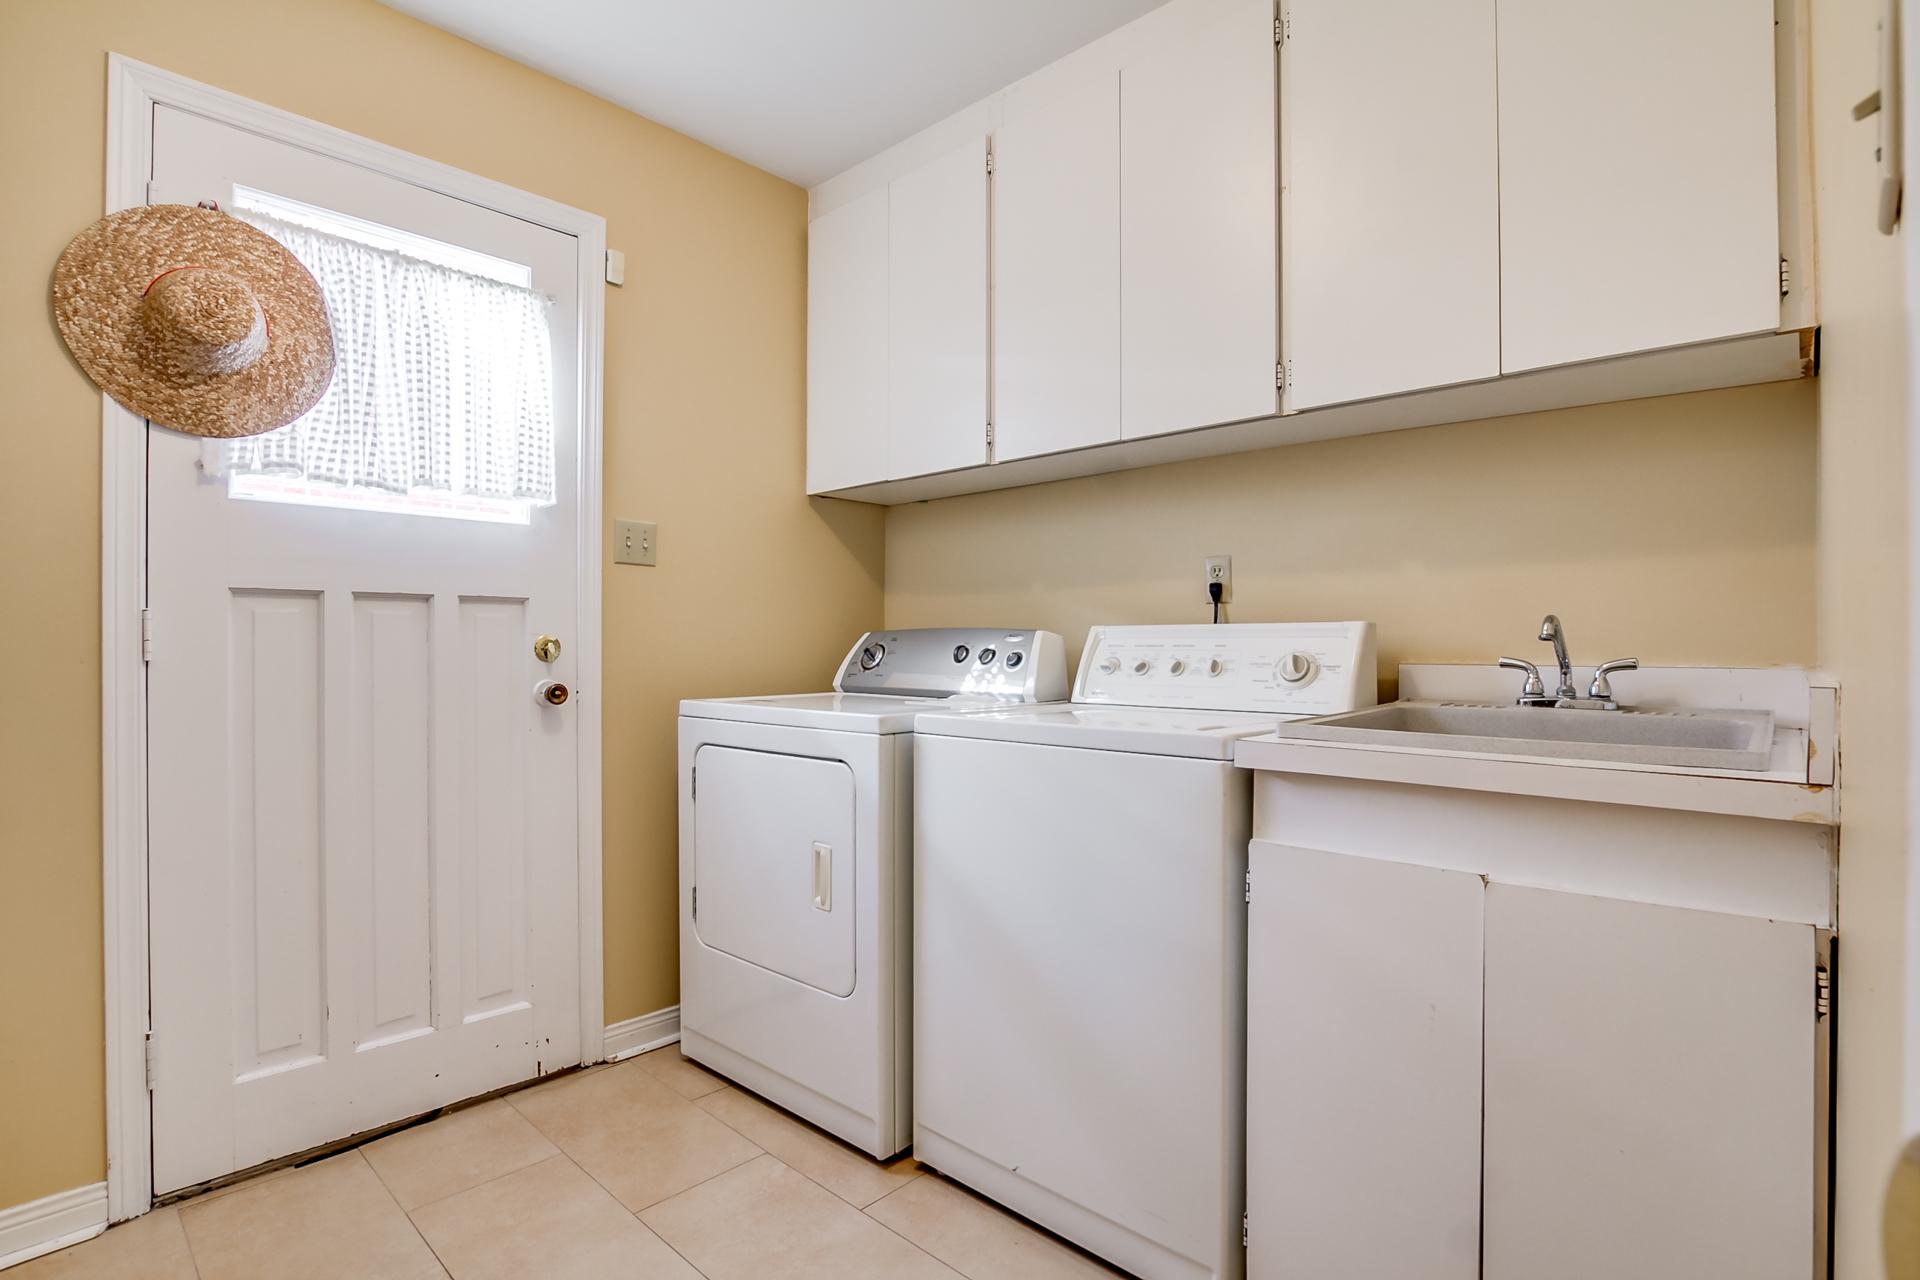 53_laundry_room1.jpg